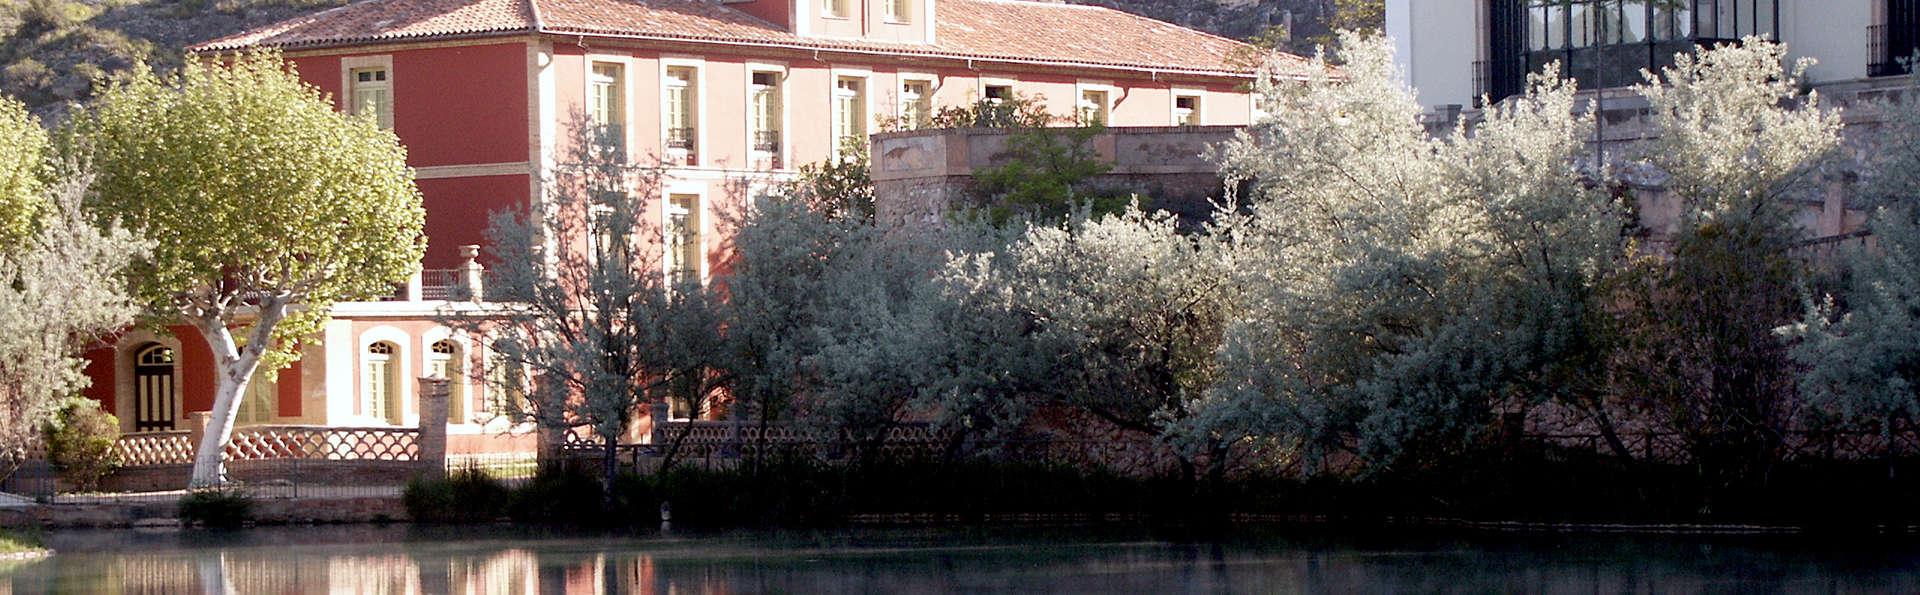 Balneario Termas Pallarés - Hotel Termas - Edit_front.jpg